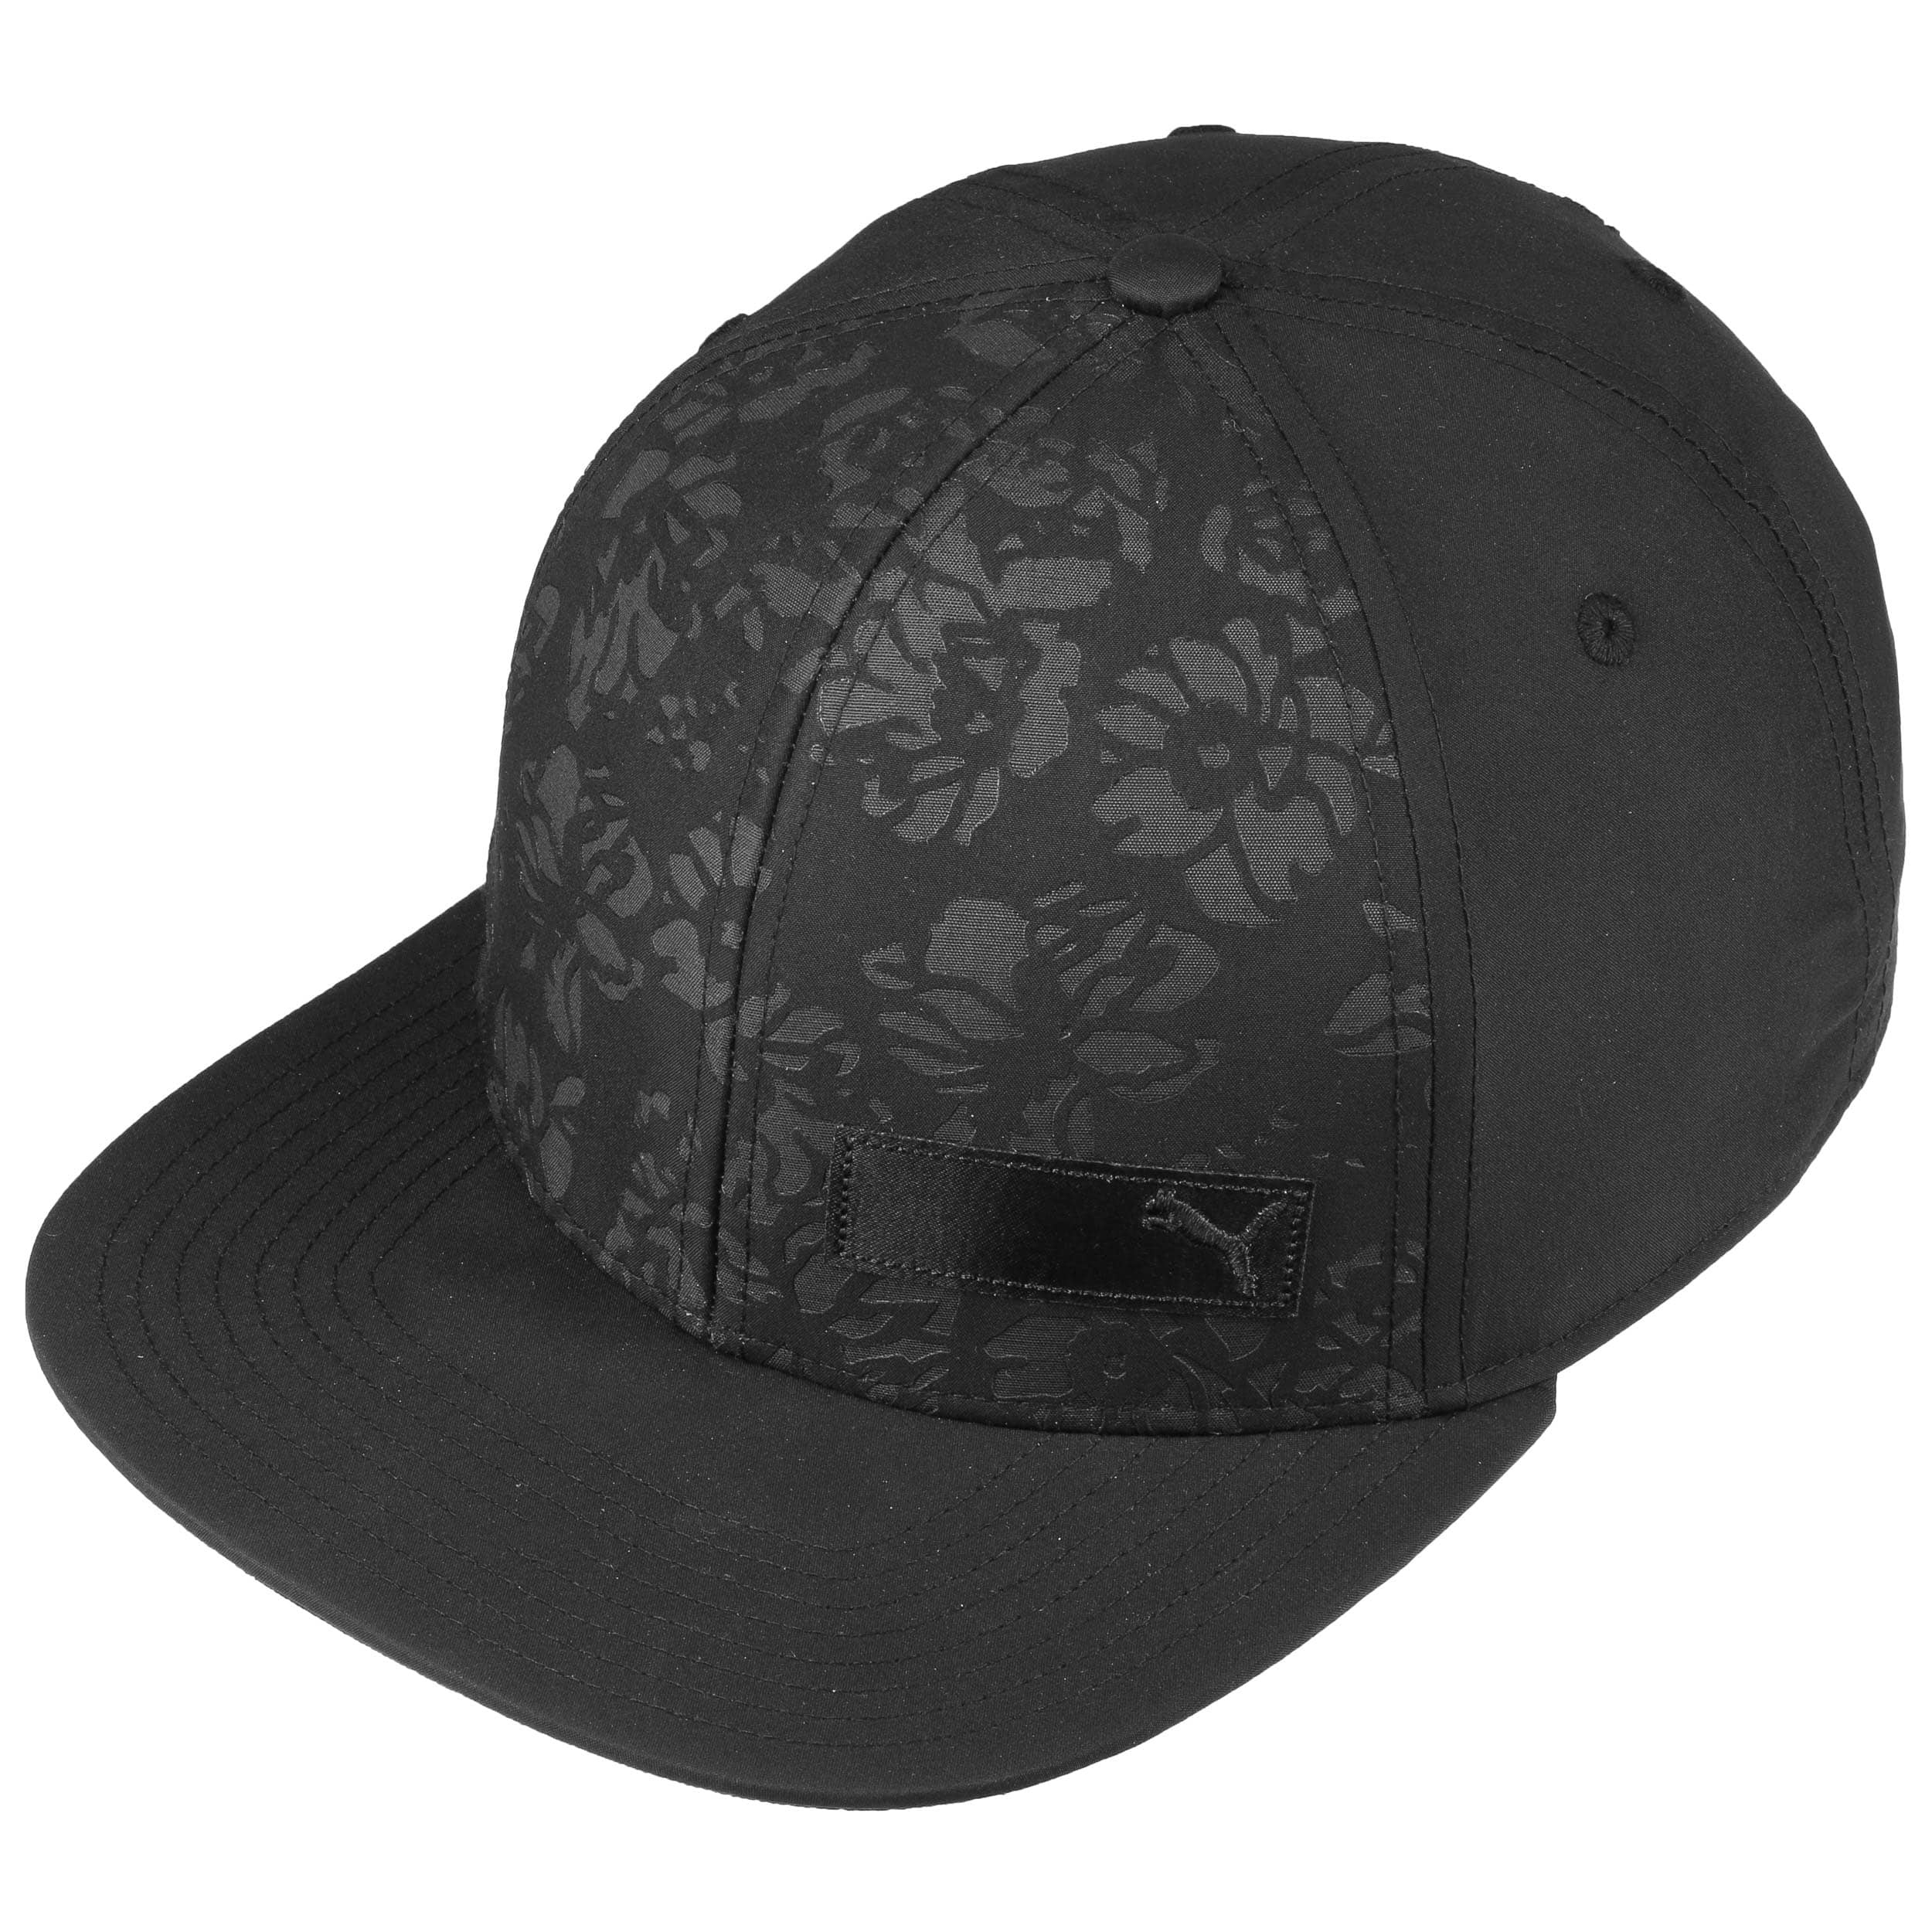 newest 61756 bdafc Floral Flat Brim Women´s Cap by PUMA - black 1 ...